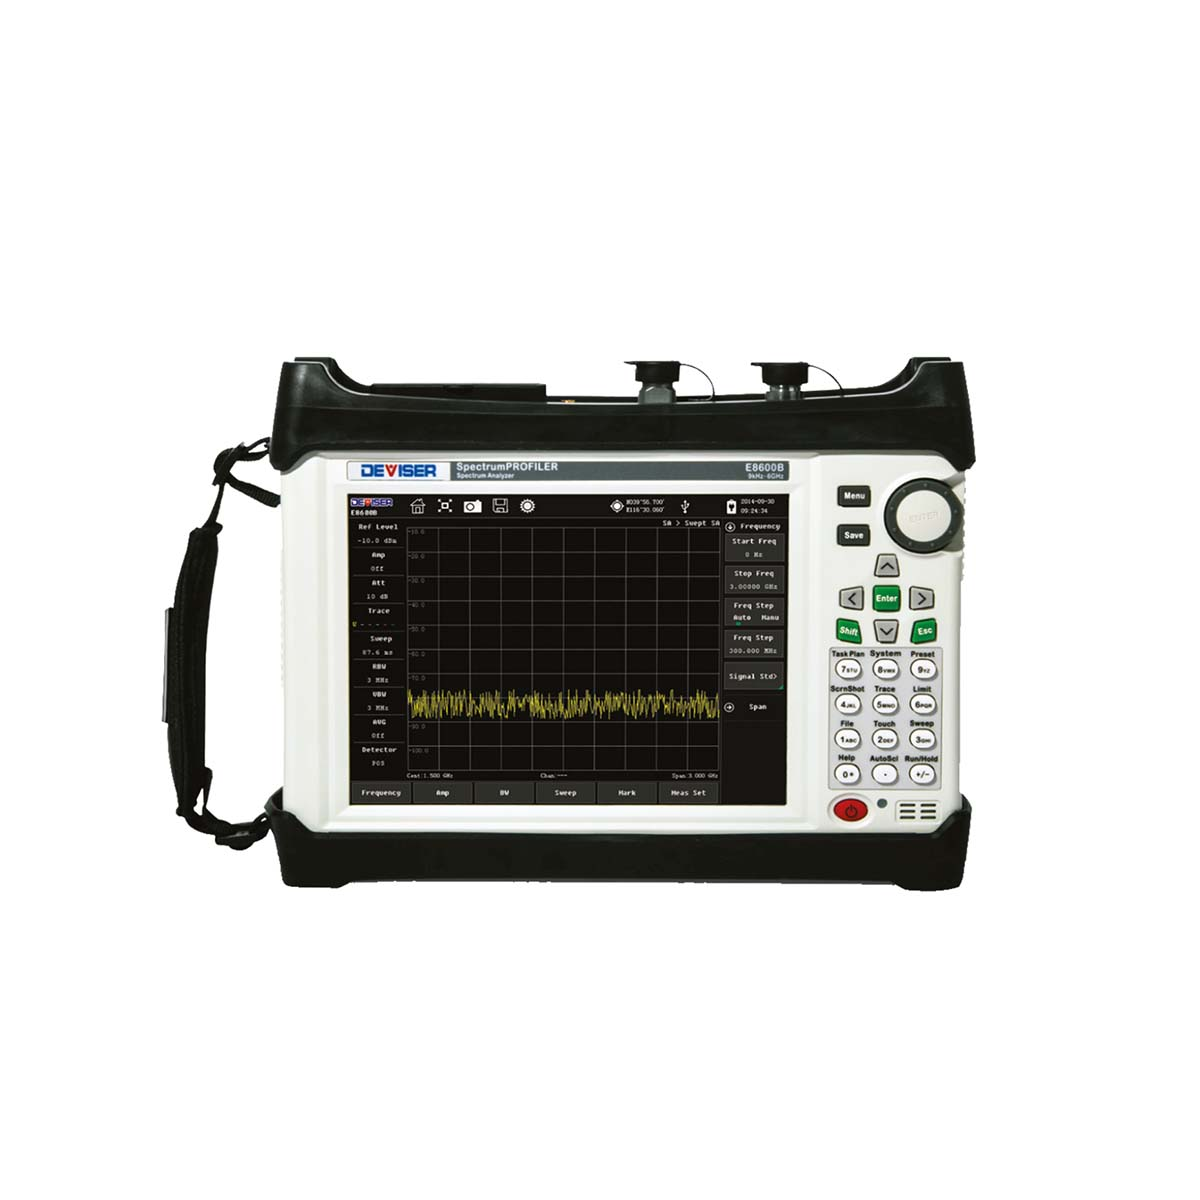 Analizador de espectro portátil DEVISER SERIE E8600B 9 kHz a 6 GHz